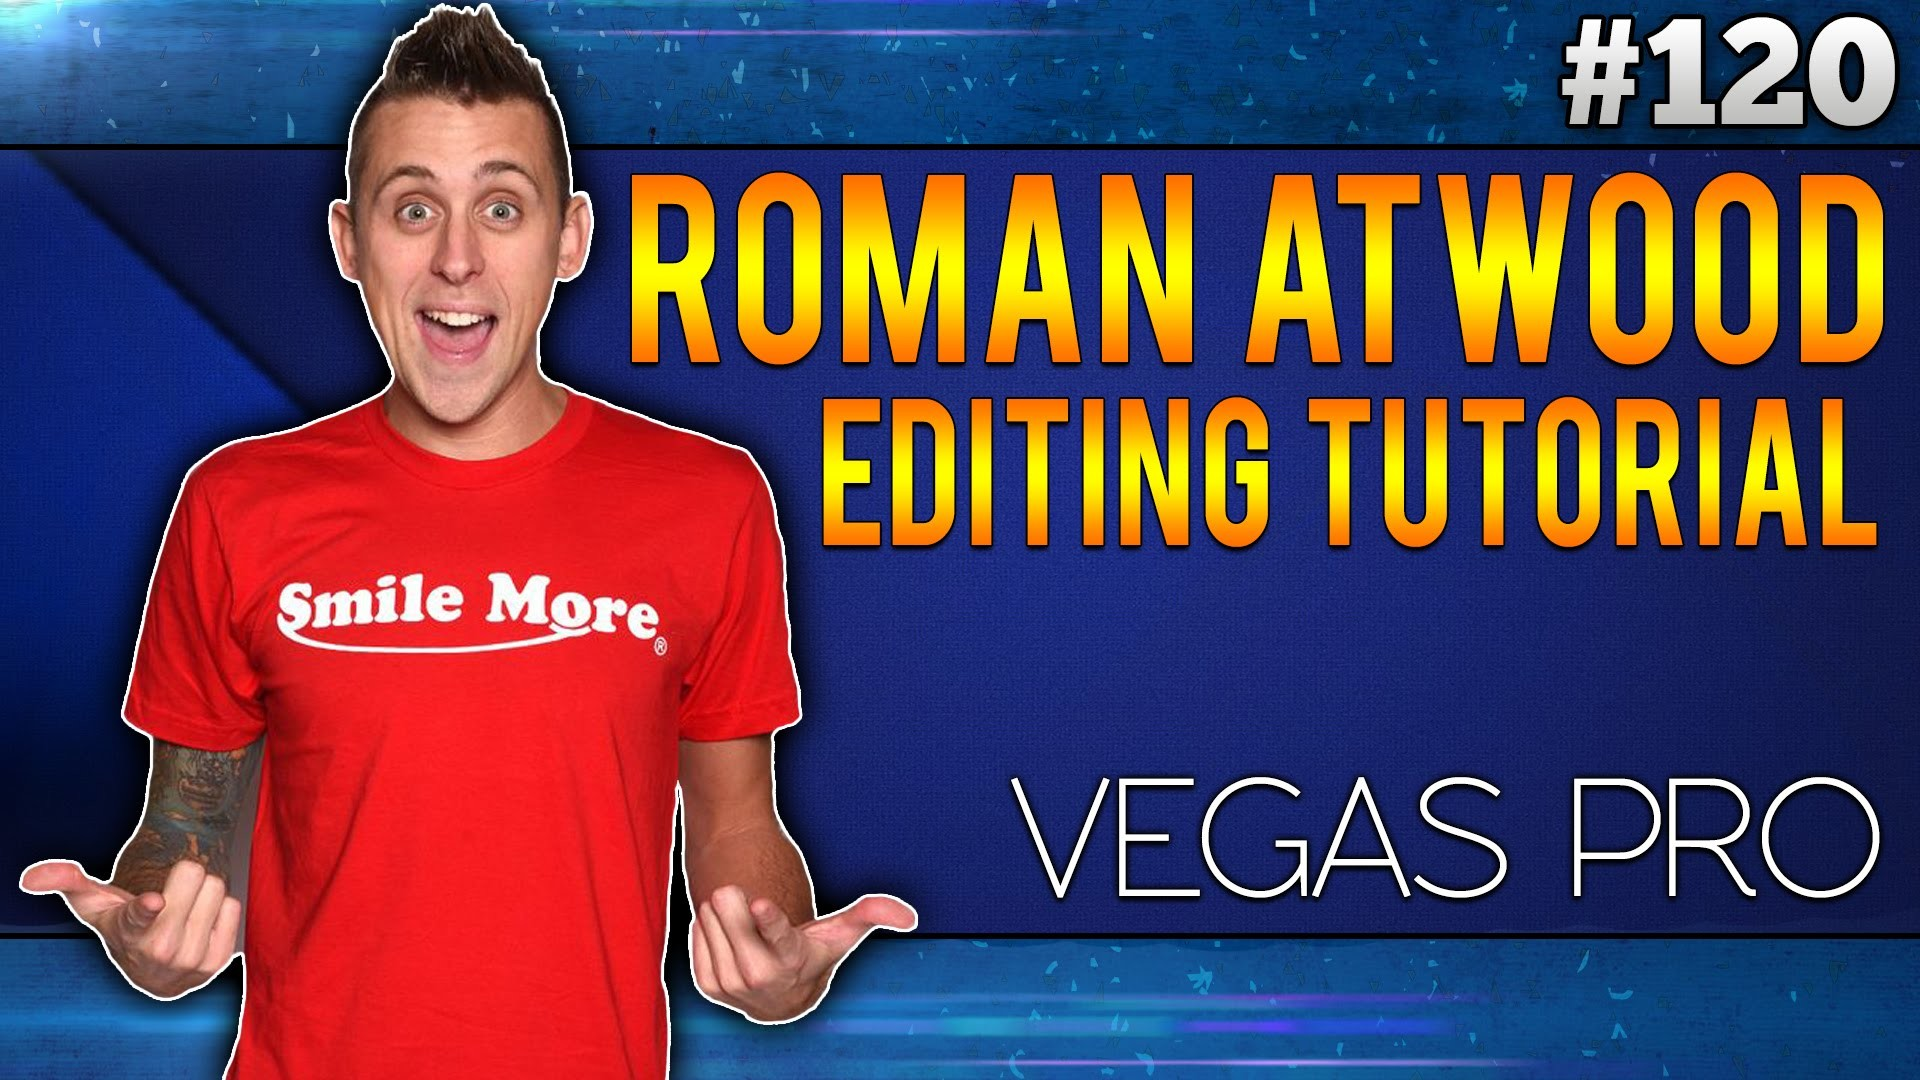 Sony Vegas Pro 13: How To Edit Vlogs Like Roman Atwood – Tutorial #120 –  YouTube